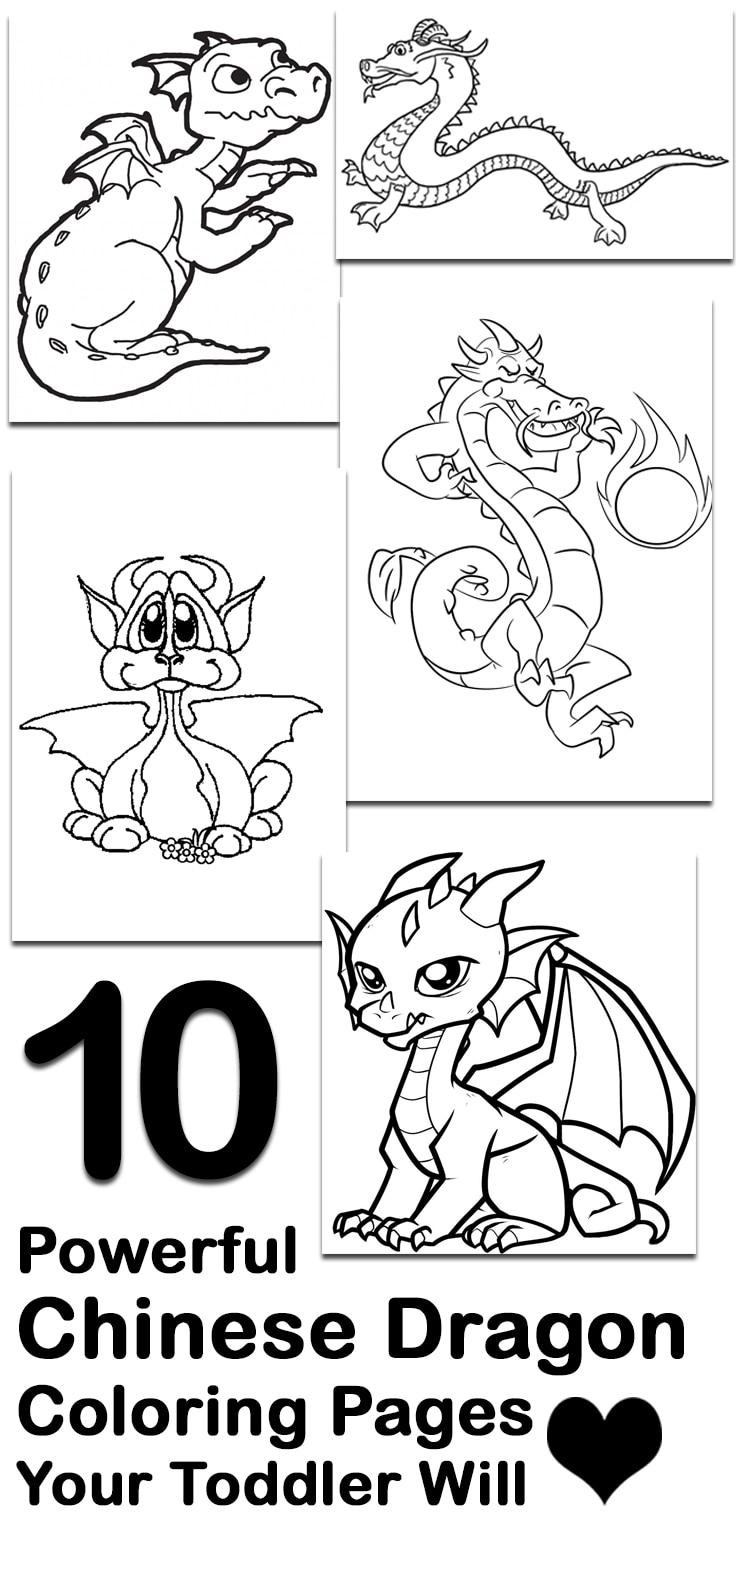 top 10 free printable chinese dragon coloring pages online - Baby Chinese Dragon Coloring Pages